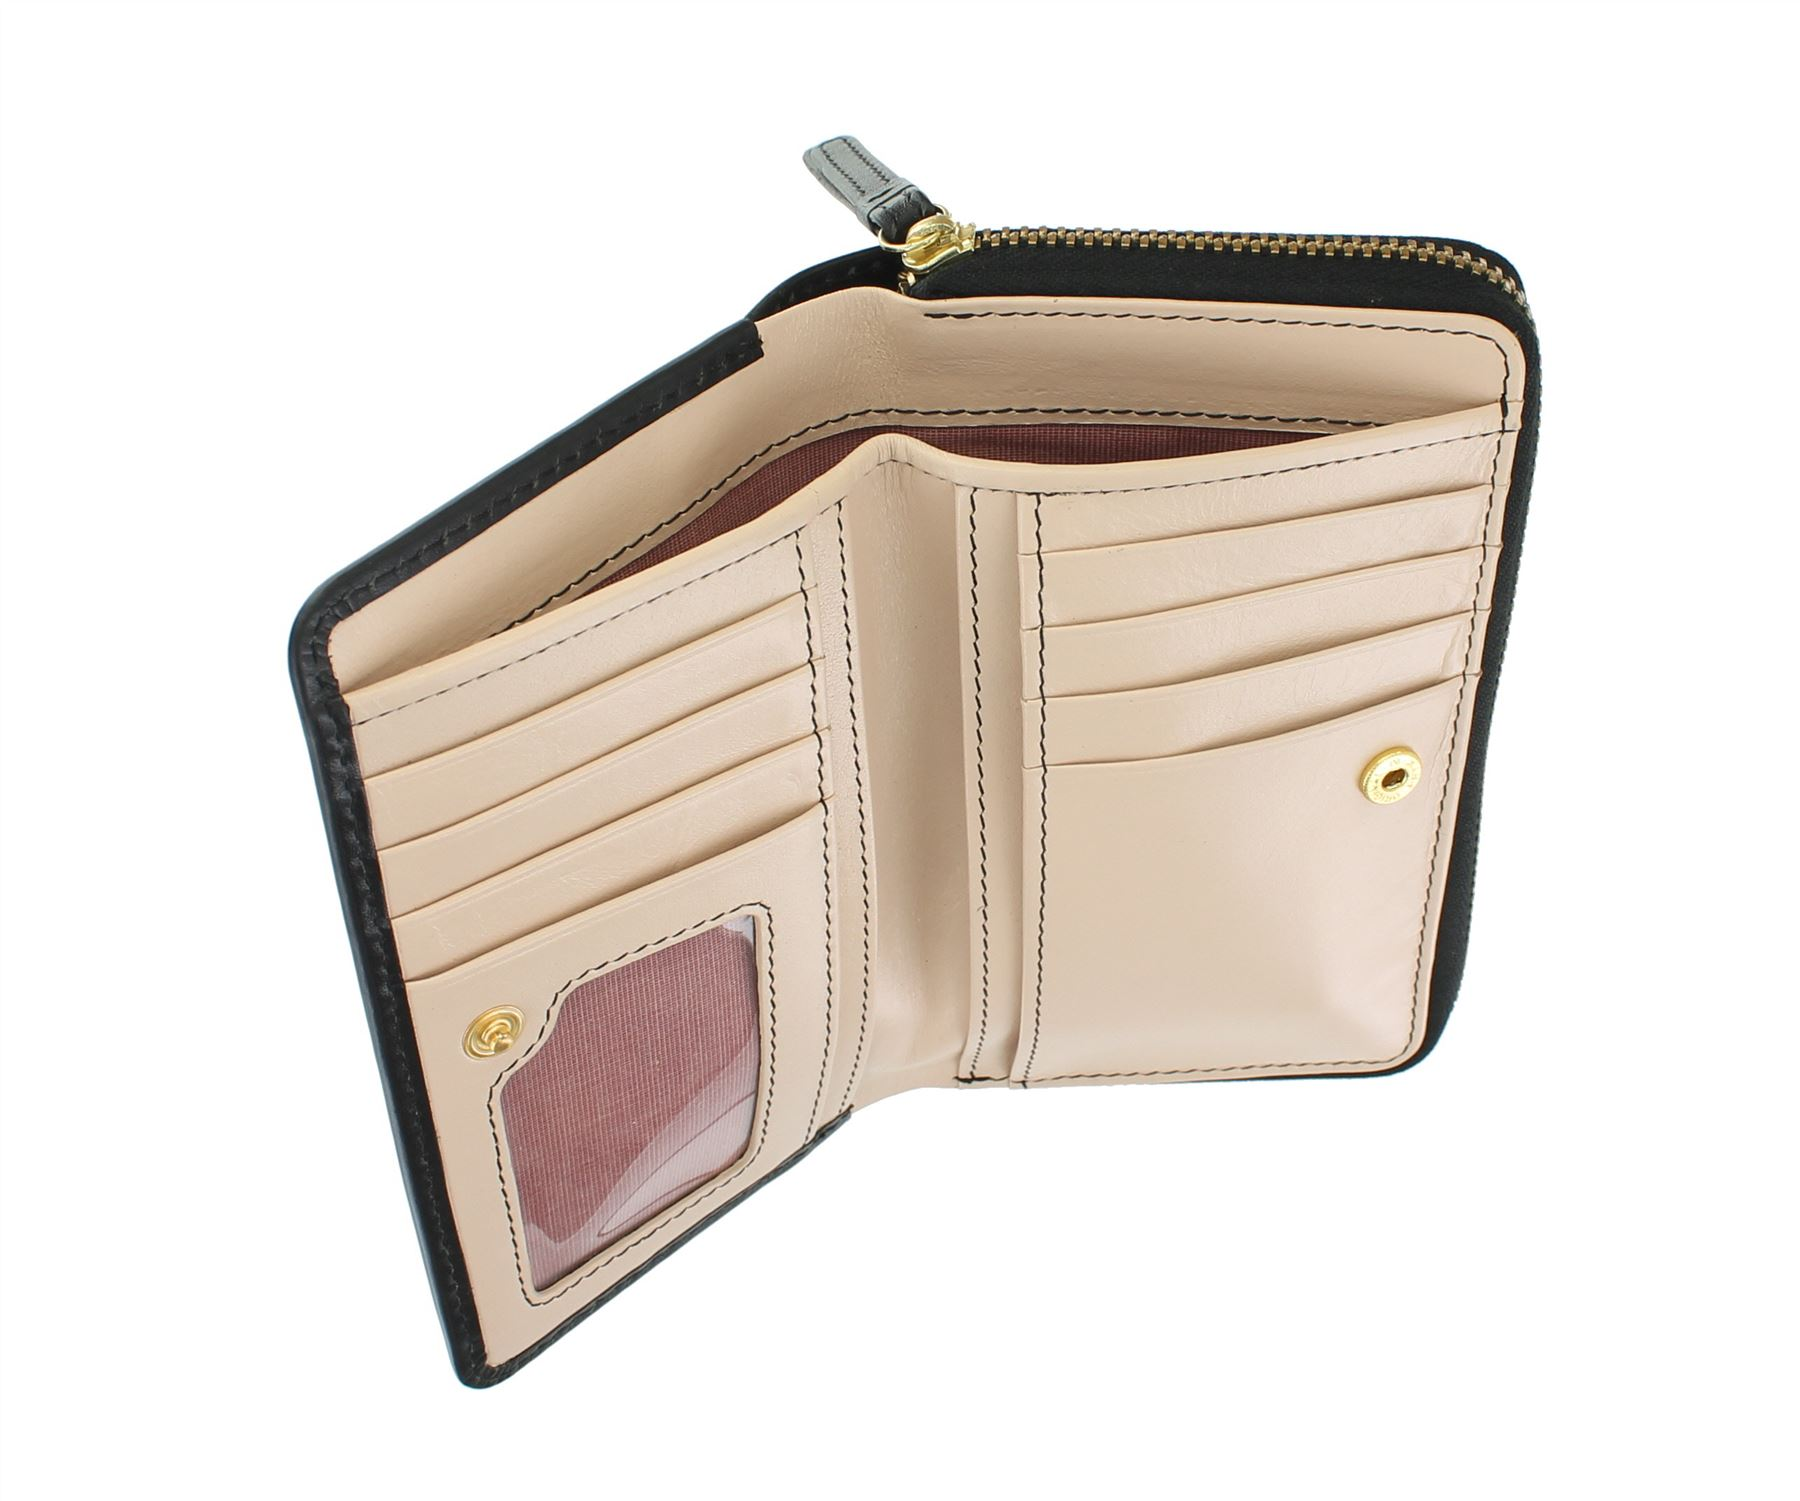 pillar Stock Purse Leather en corgi en De Smooth Stock en Black Stock Ladies Originals With Stock Rupture lily Contrast Box Tula 7656 mouse en Interior 2 navy tan w1ItqSt